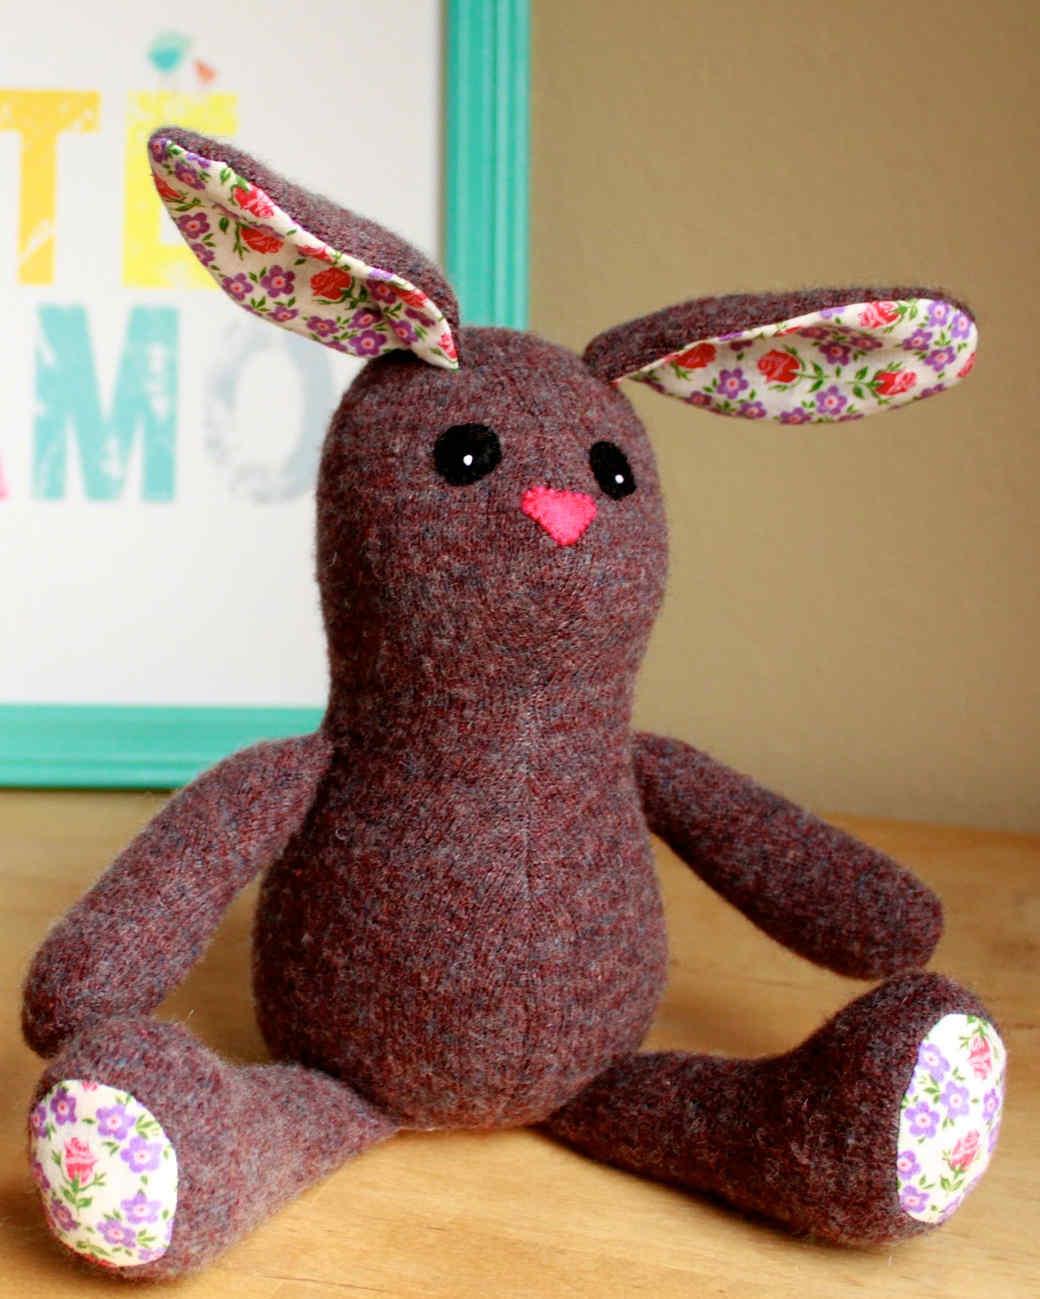 lily-gus-rabbit-am-032014.jpg